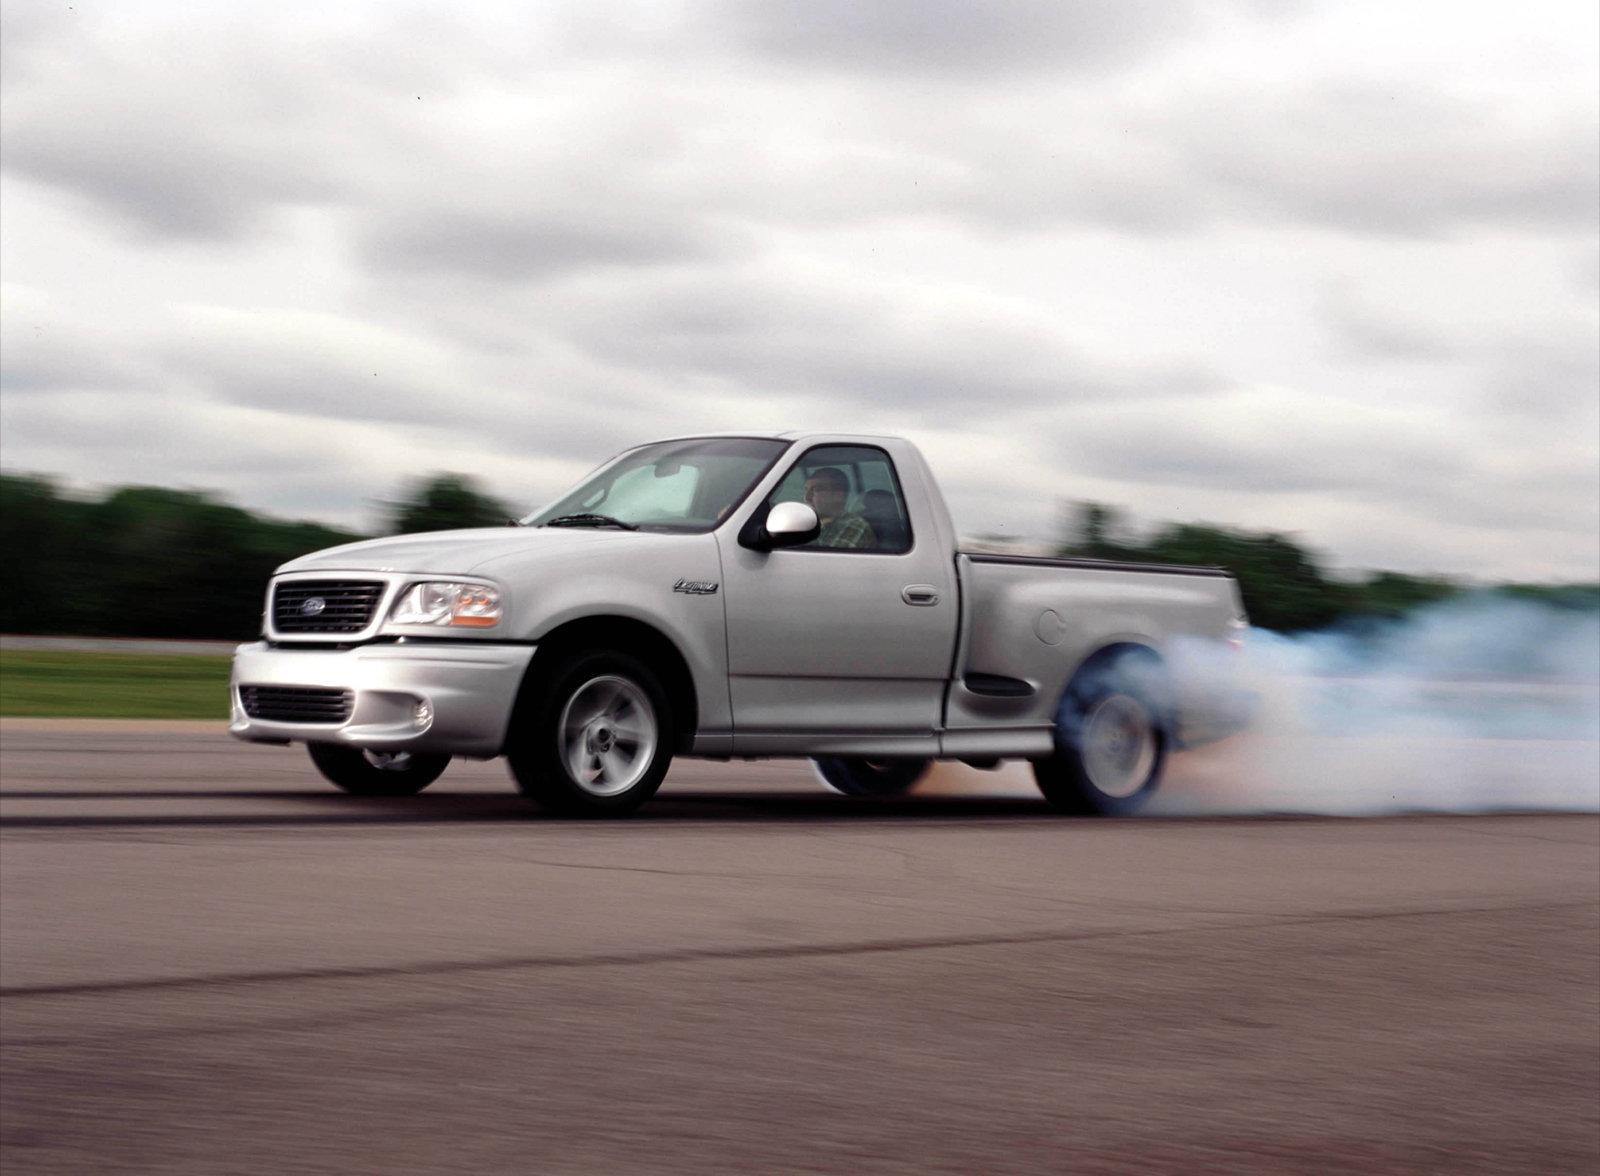 2004 Ford F150 SVT Lightning burnout